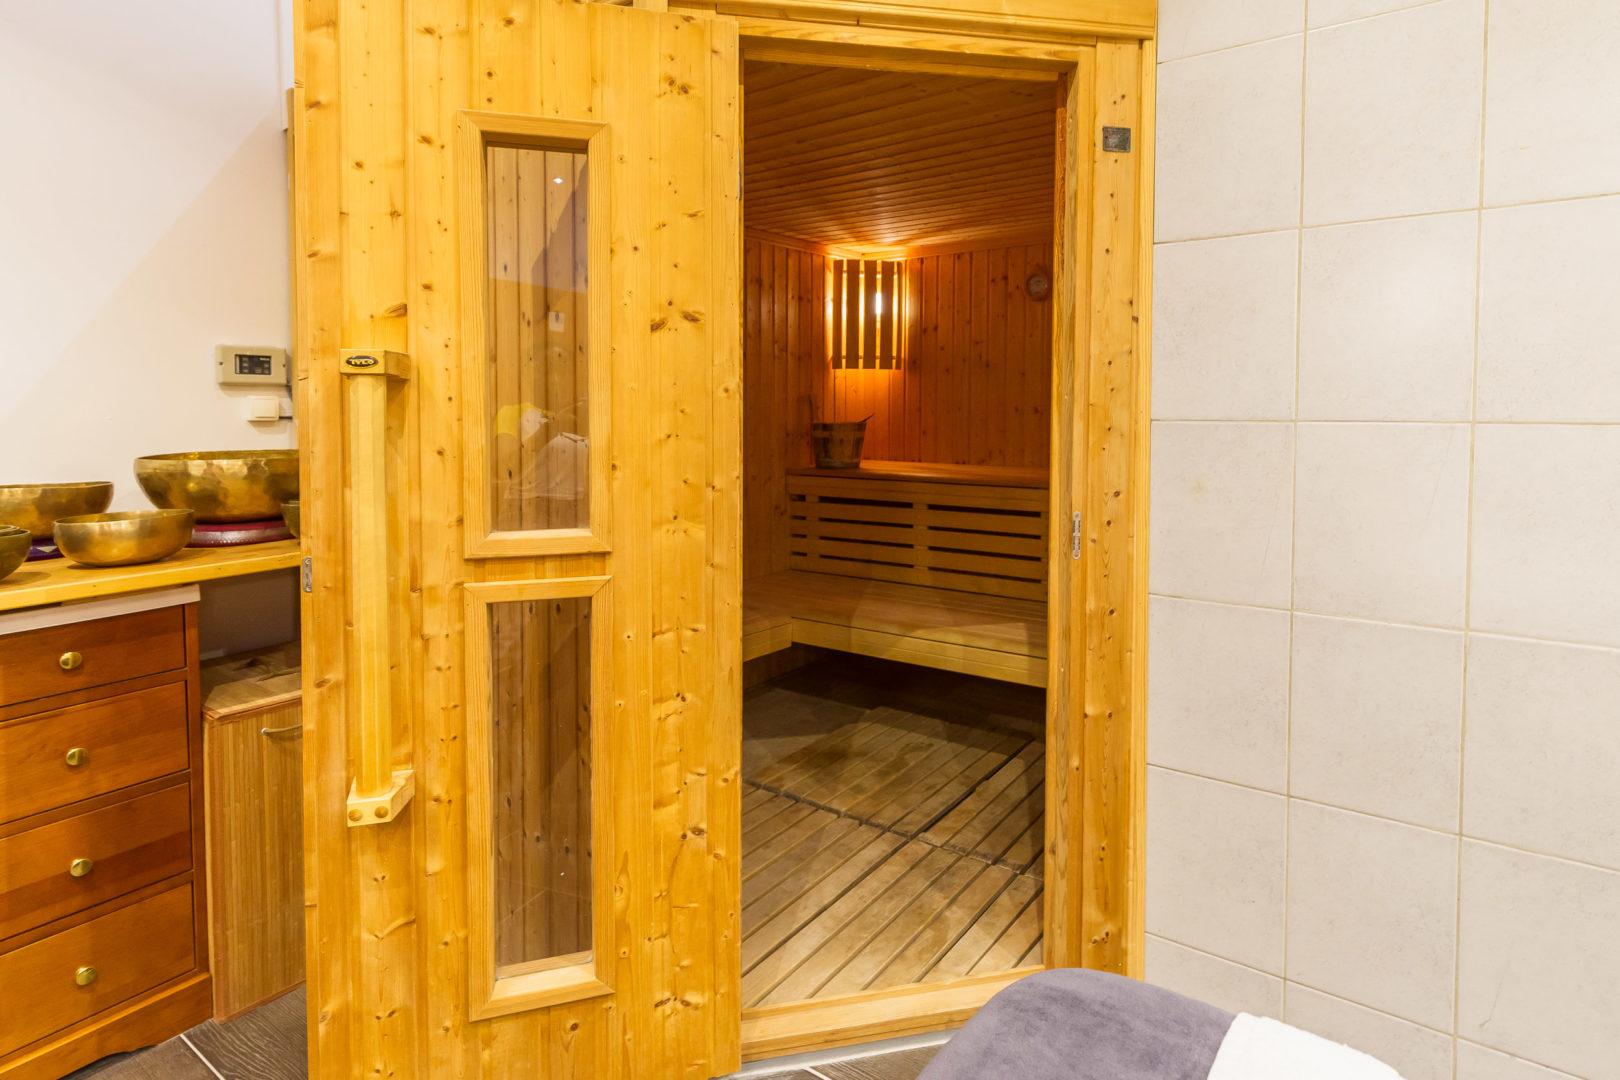 spa - le sauna